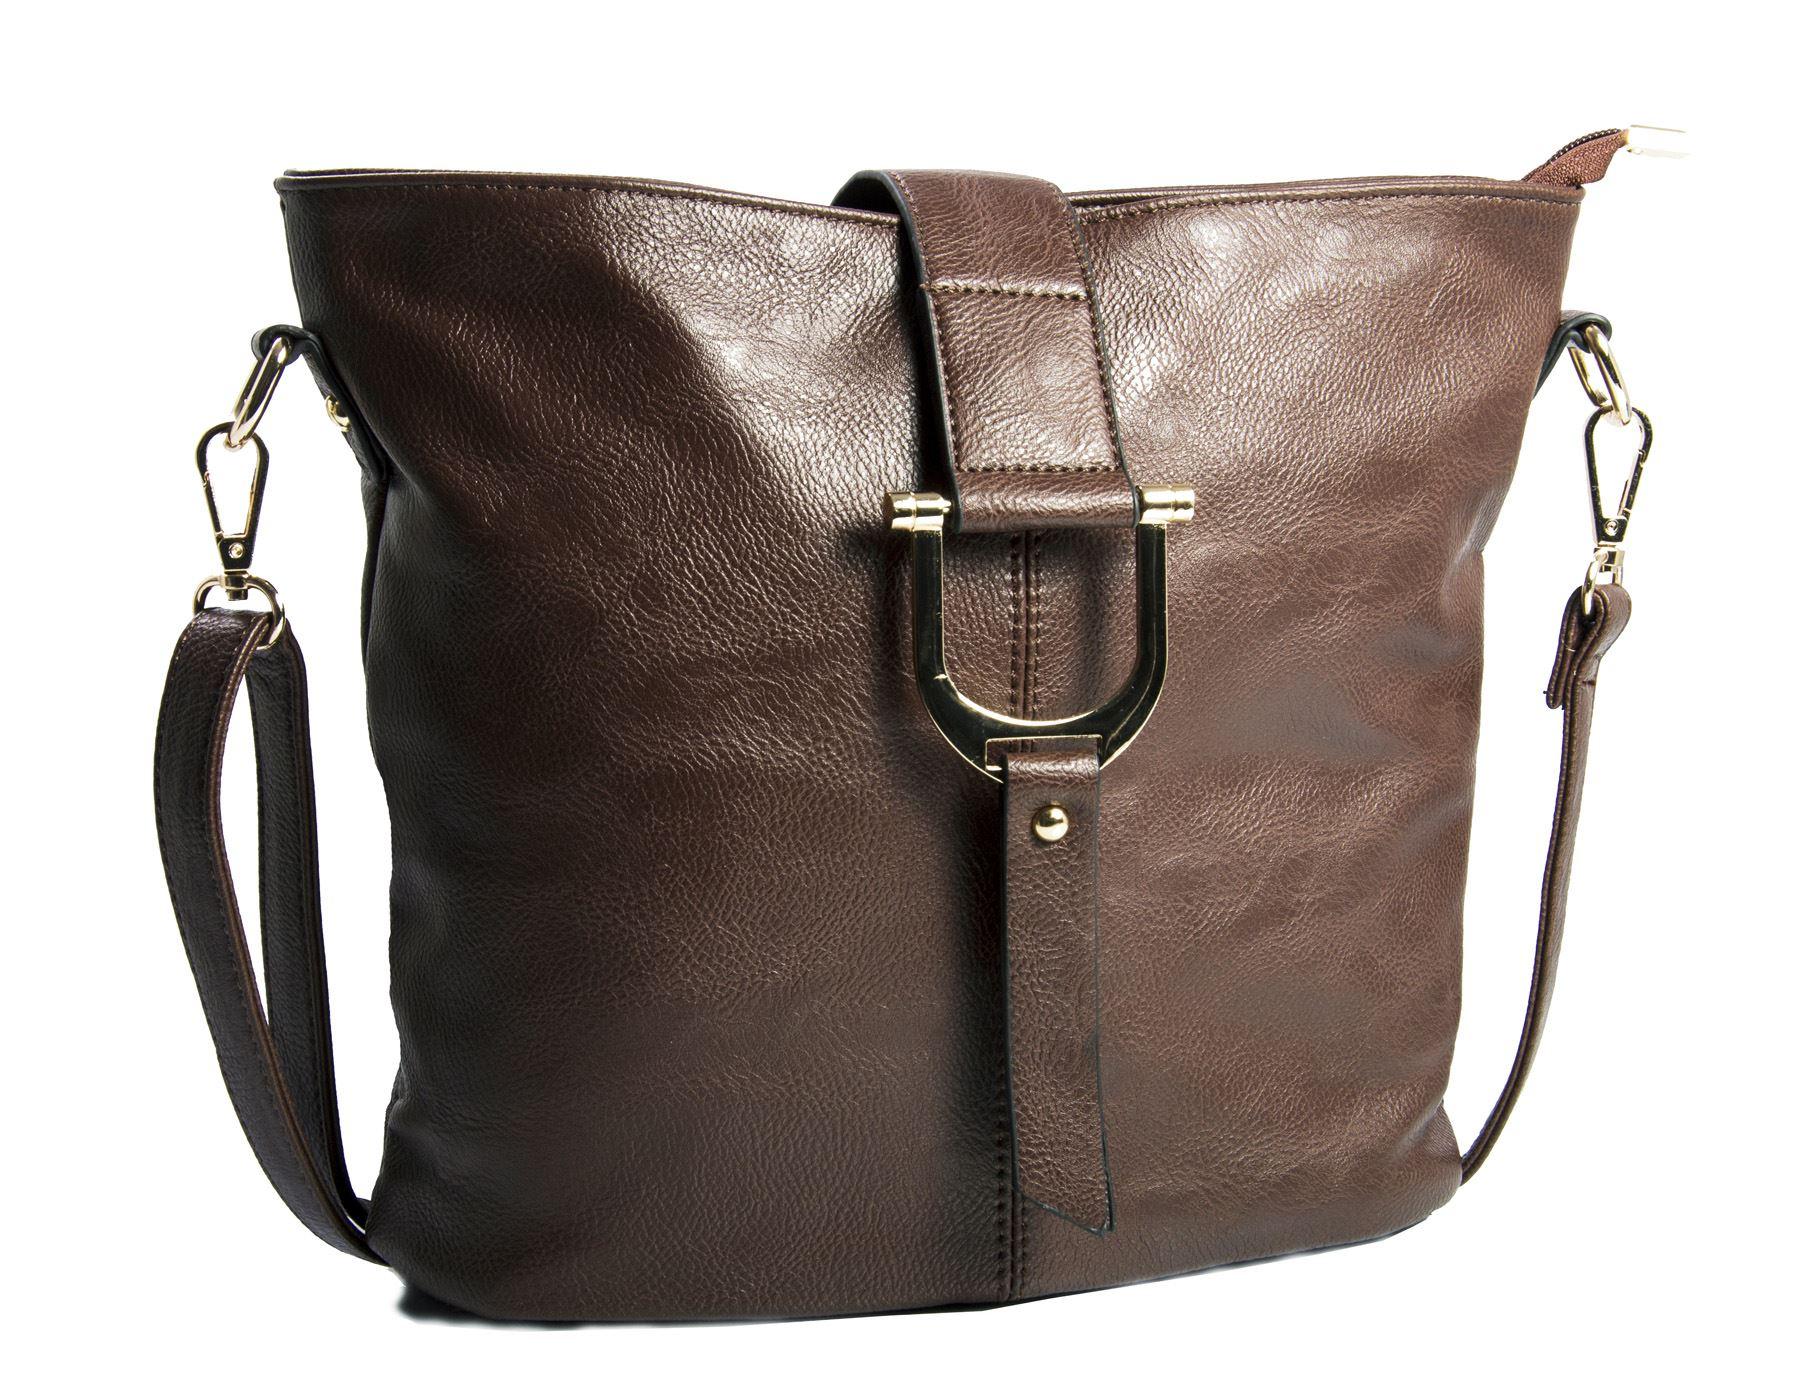 Big Handbag Shop Womens Faux Leather Bucket Style Cross ...